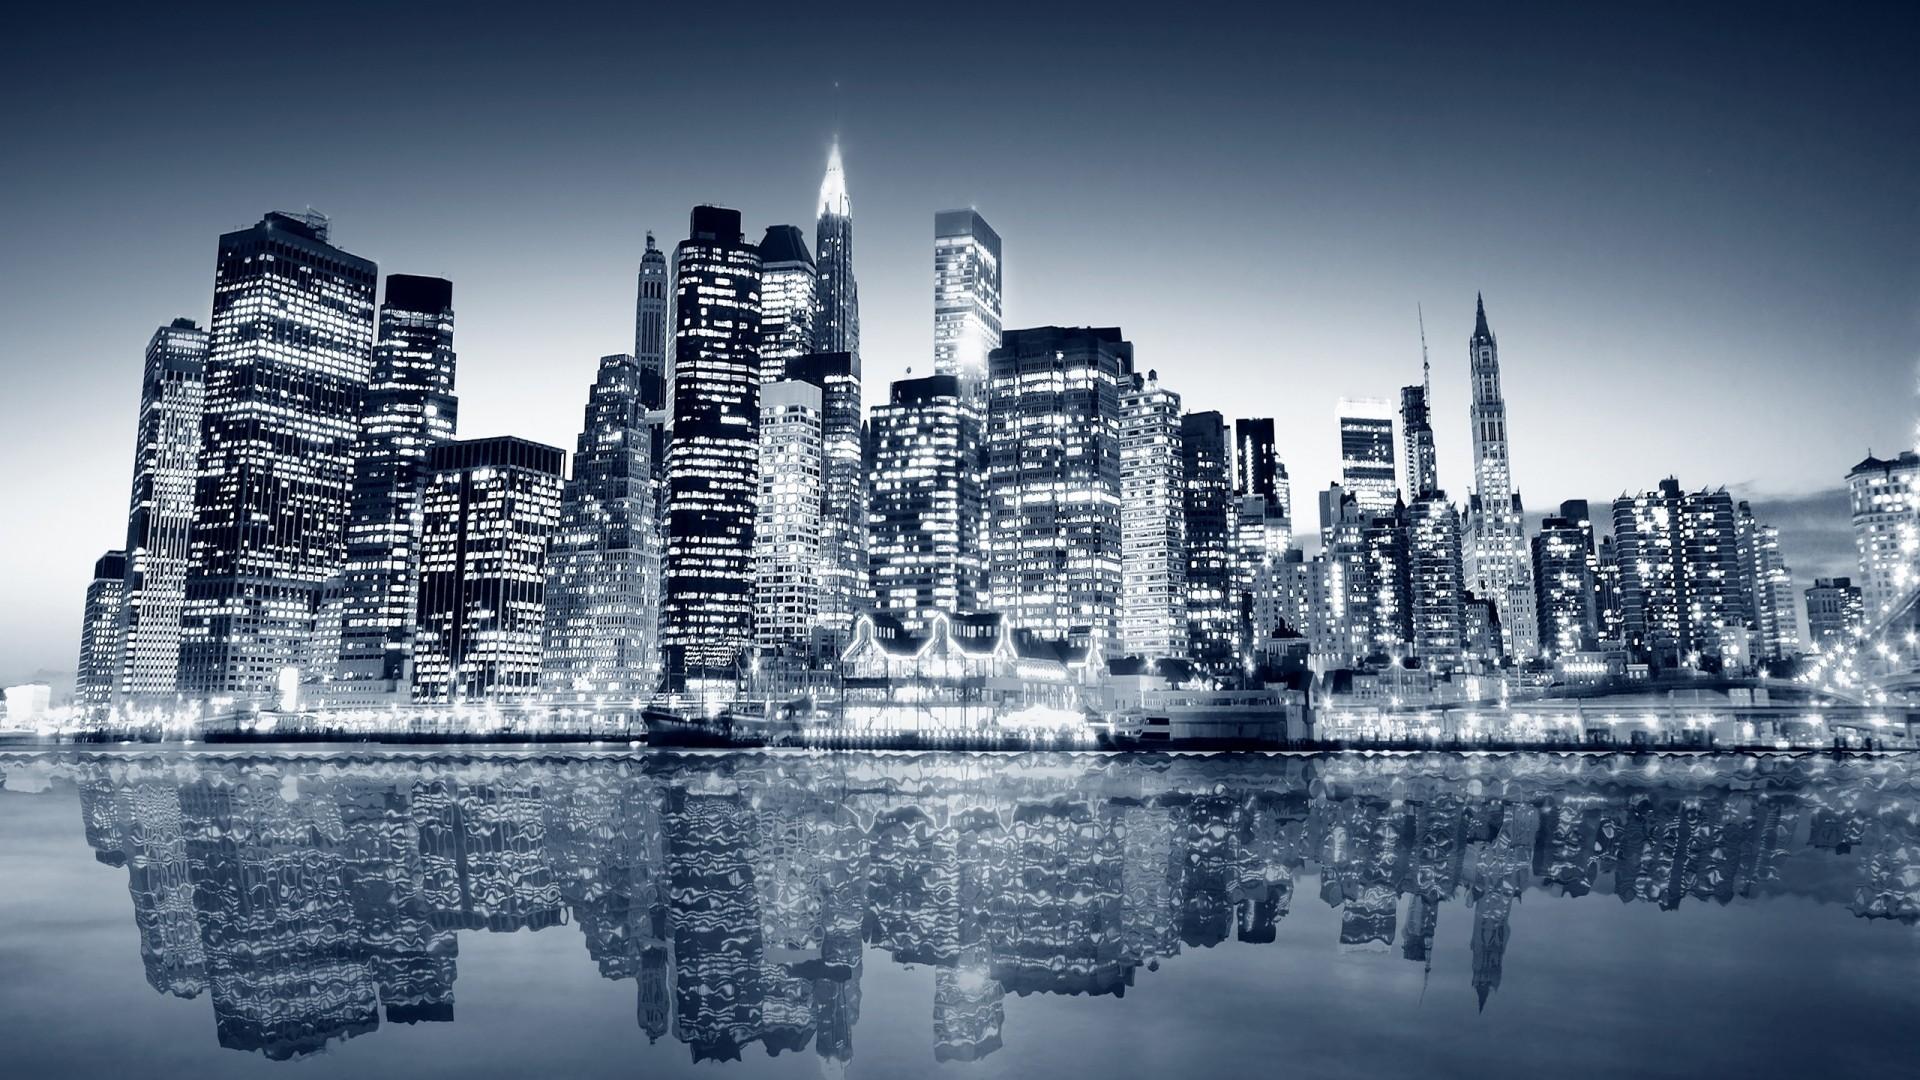 Cool Pictures New York City HD Wallpaper of City   hdwallpaper2013com 1920x1080